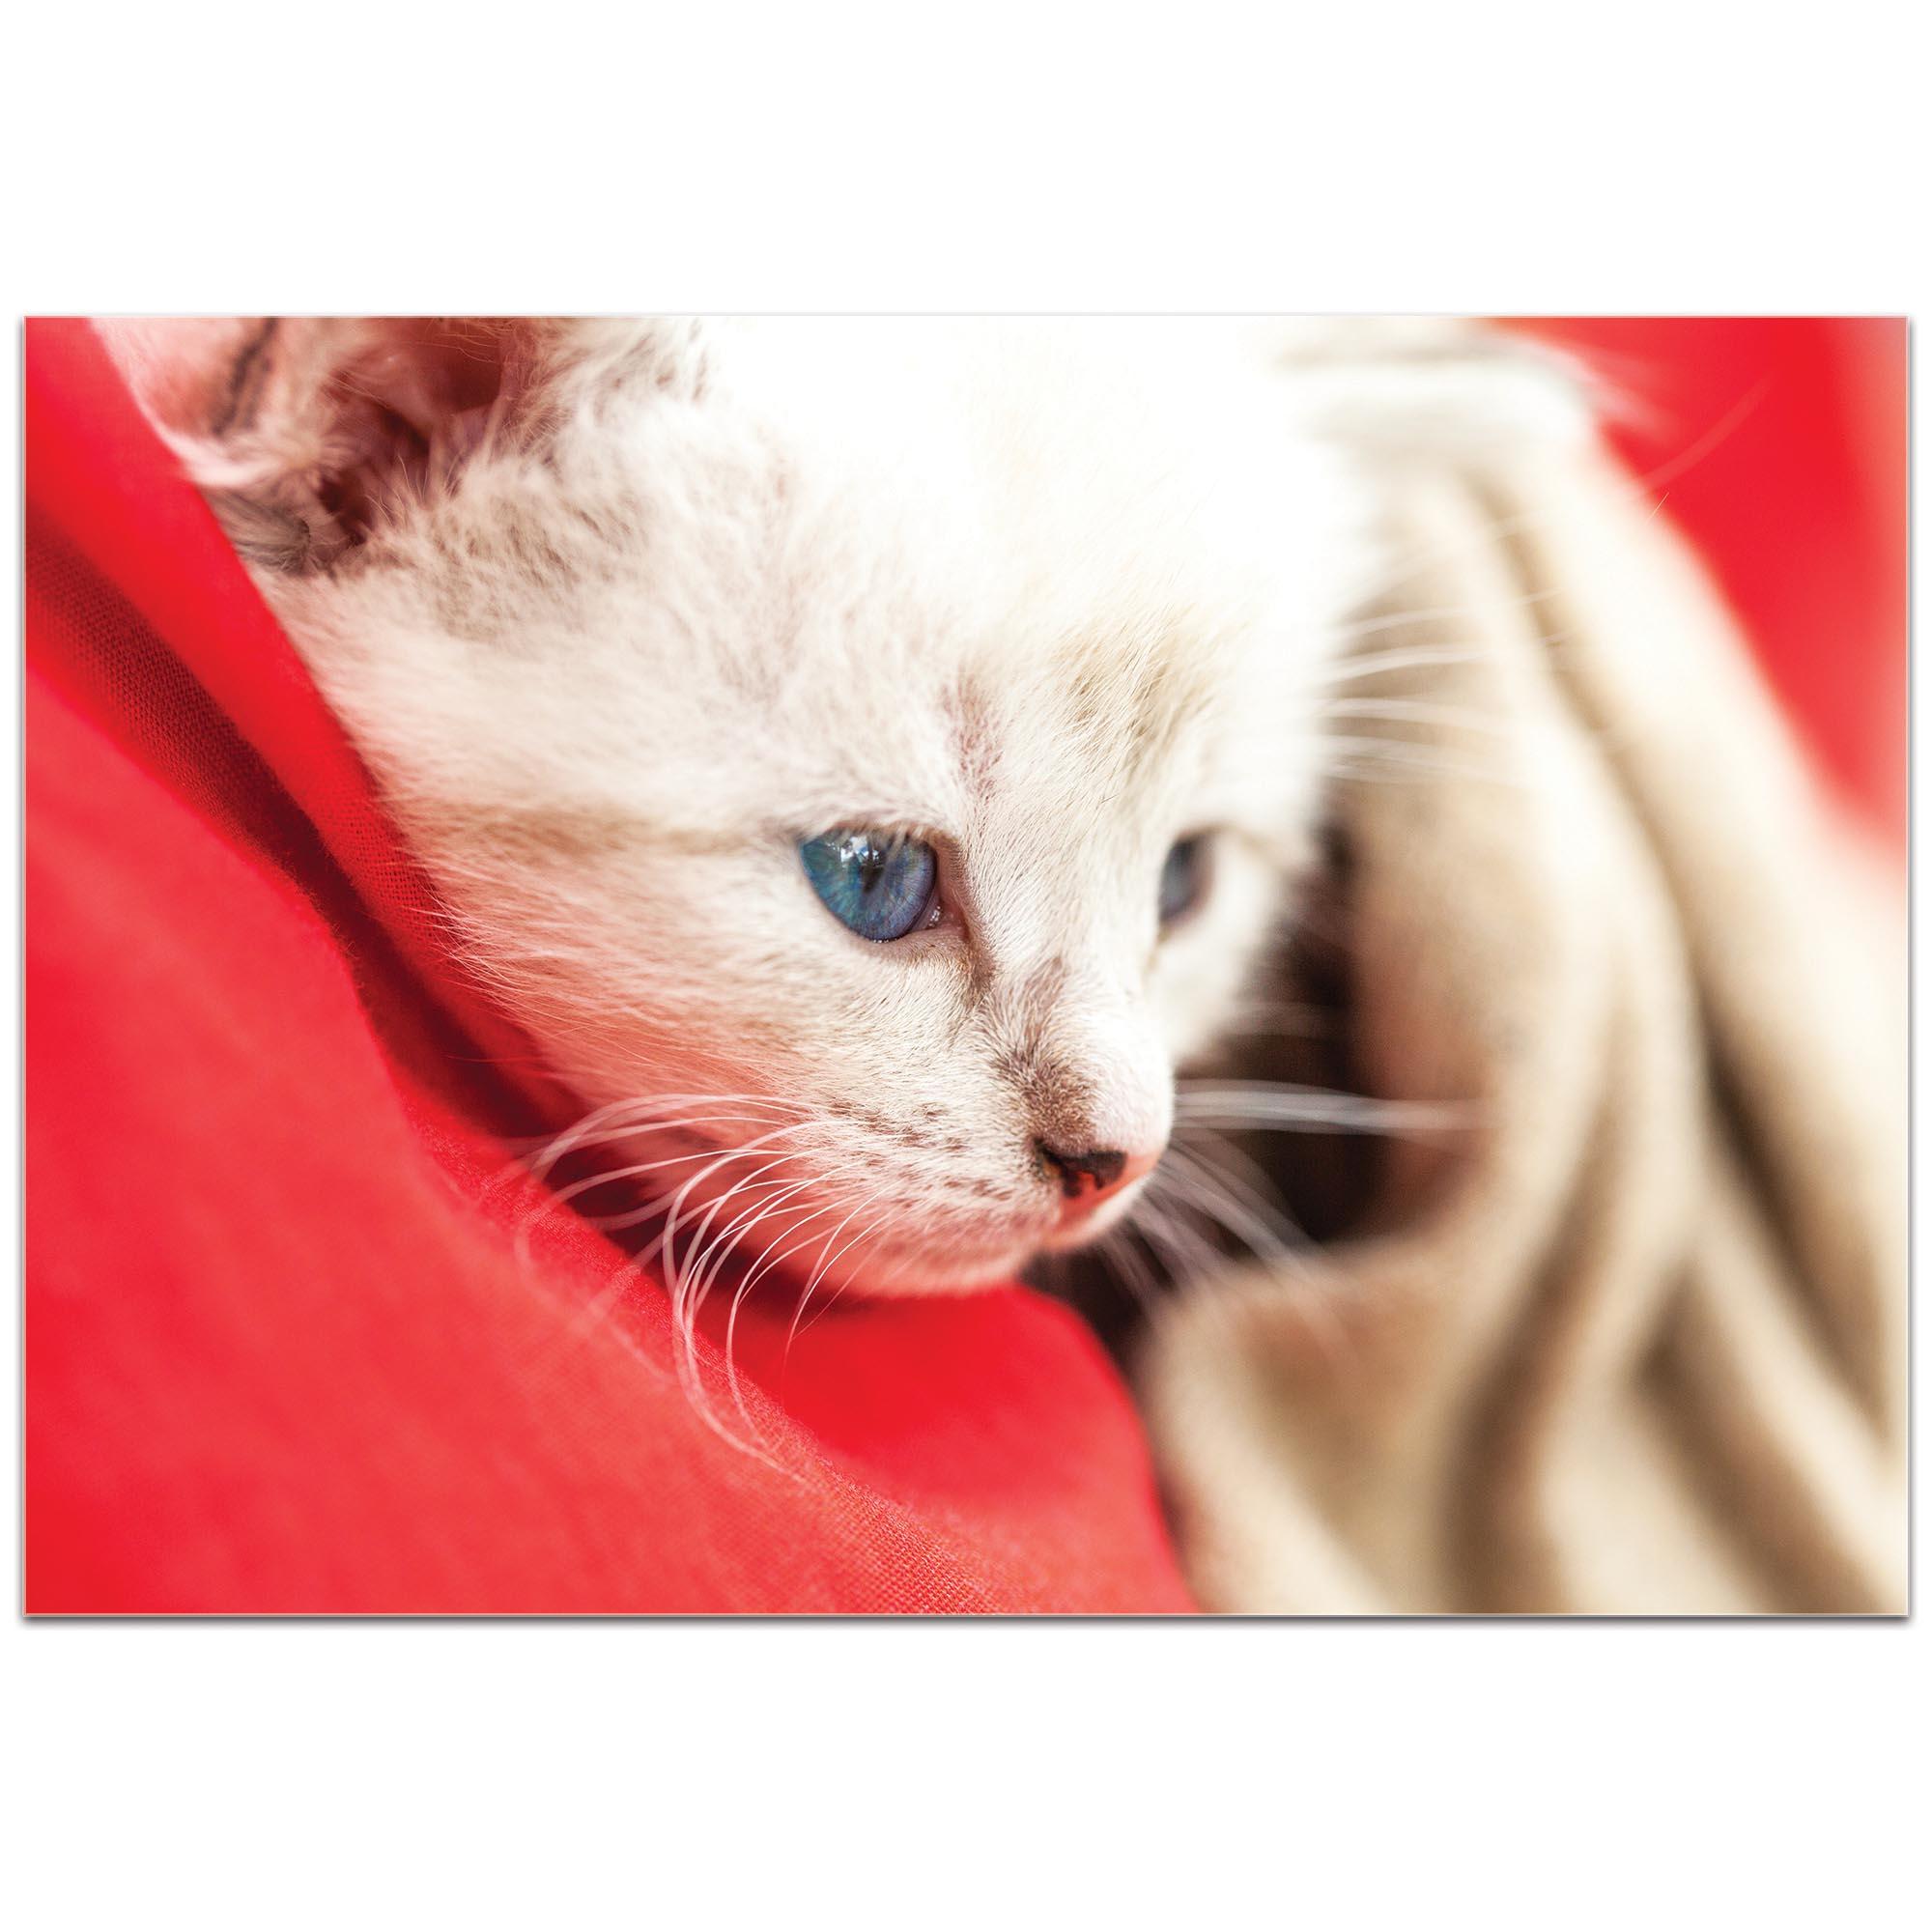 Casual Wall Art 'Bundled Kitten' - Wildlife Decor on Metal or Plexiglass - Image 2